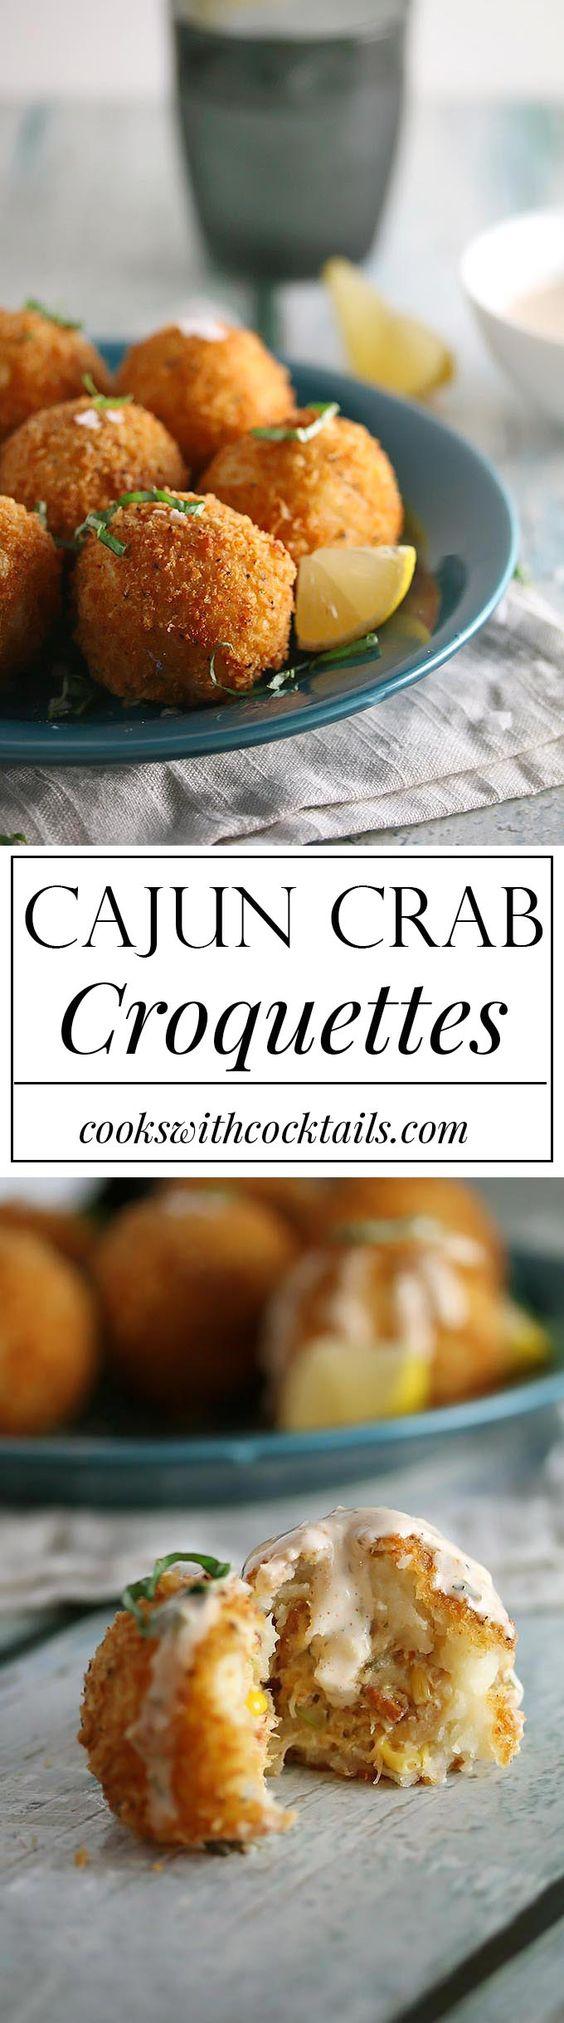 Cajun Crab Croquettes